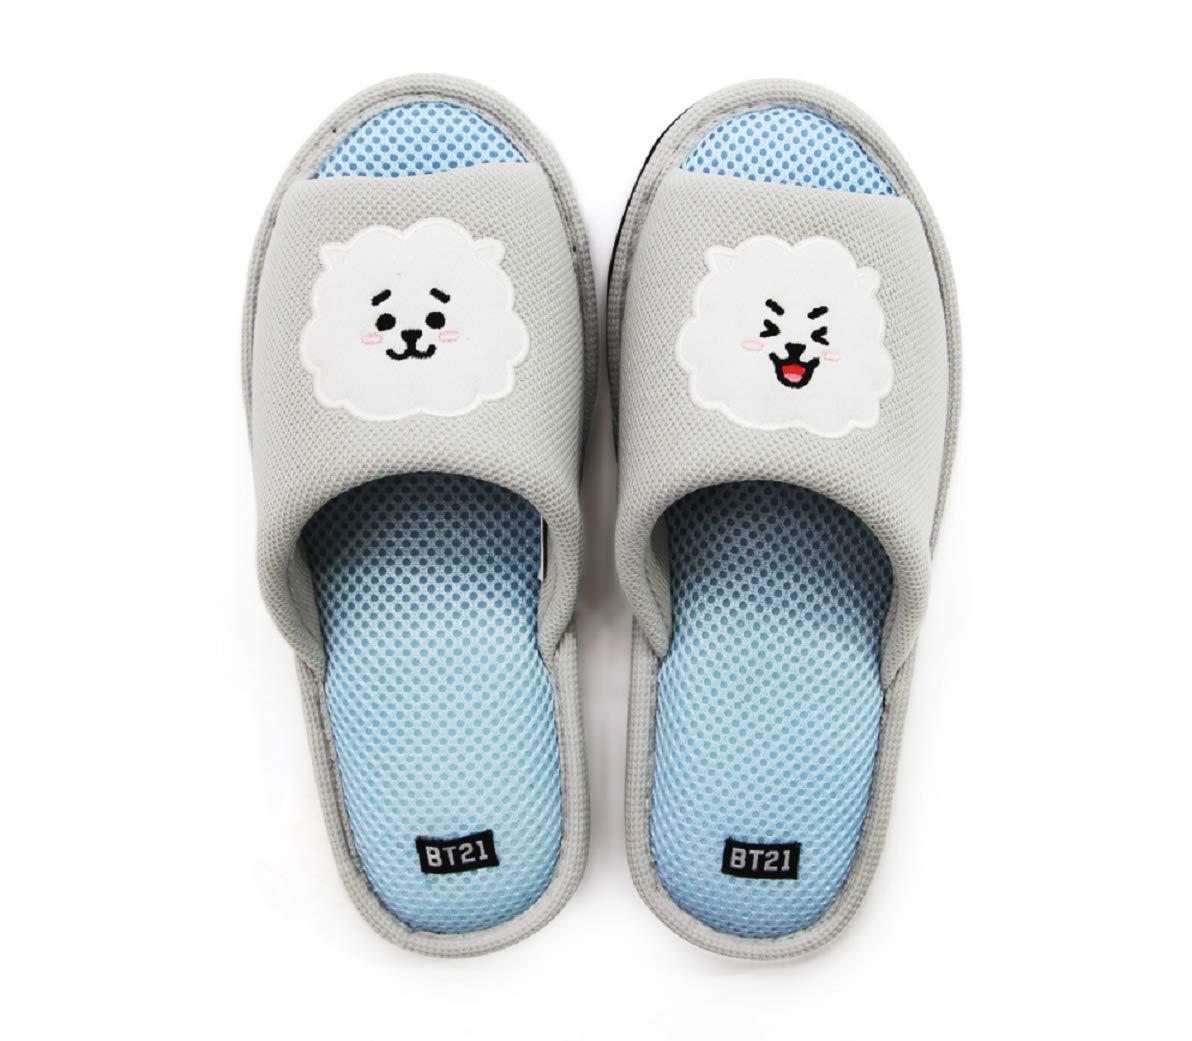 DHSPKN Kpop BTS Cartoon Chracters Slippers Jungkook Jimin Suga Indoor Winter Slipper